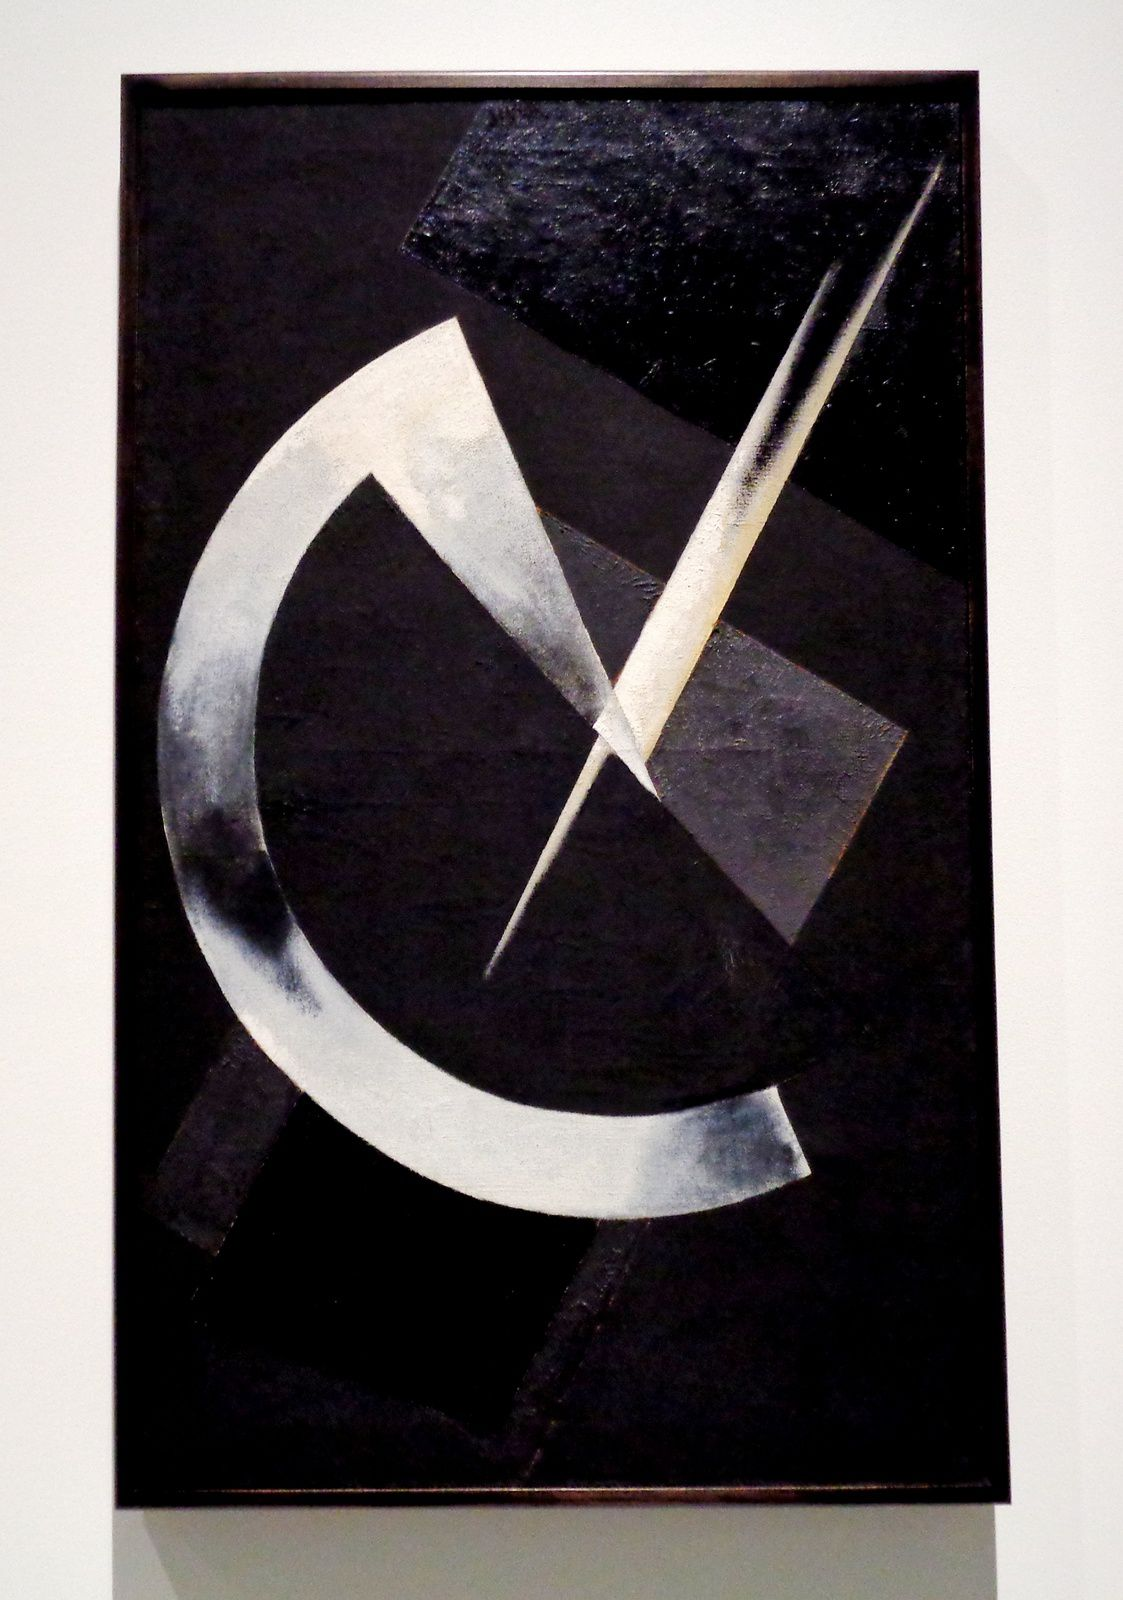 Composition 66 (86) - Alexandre Rodtchenko, 1919